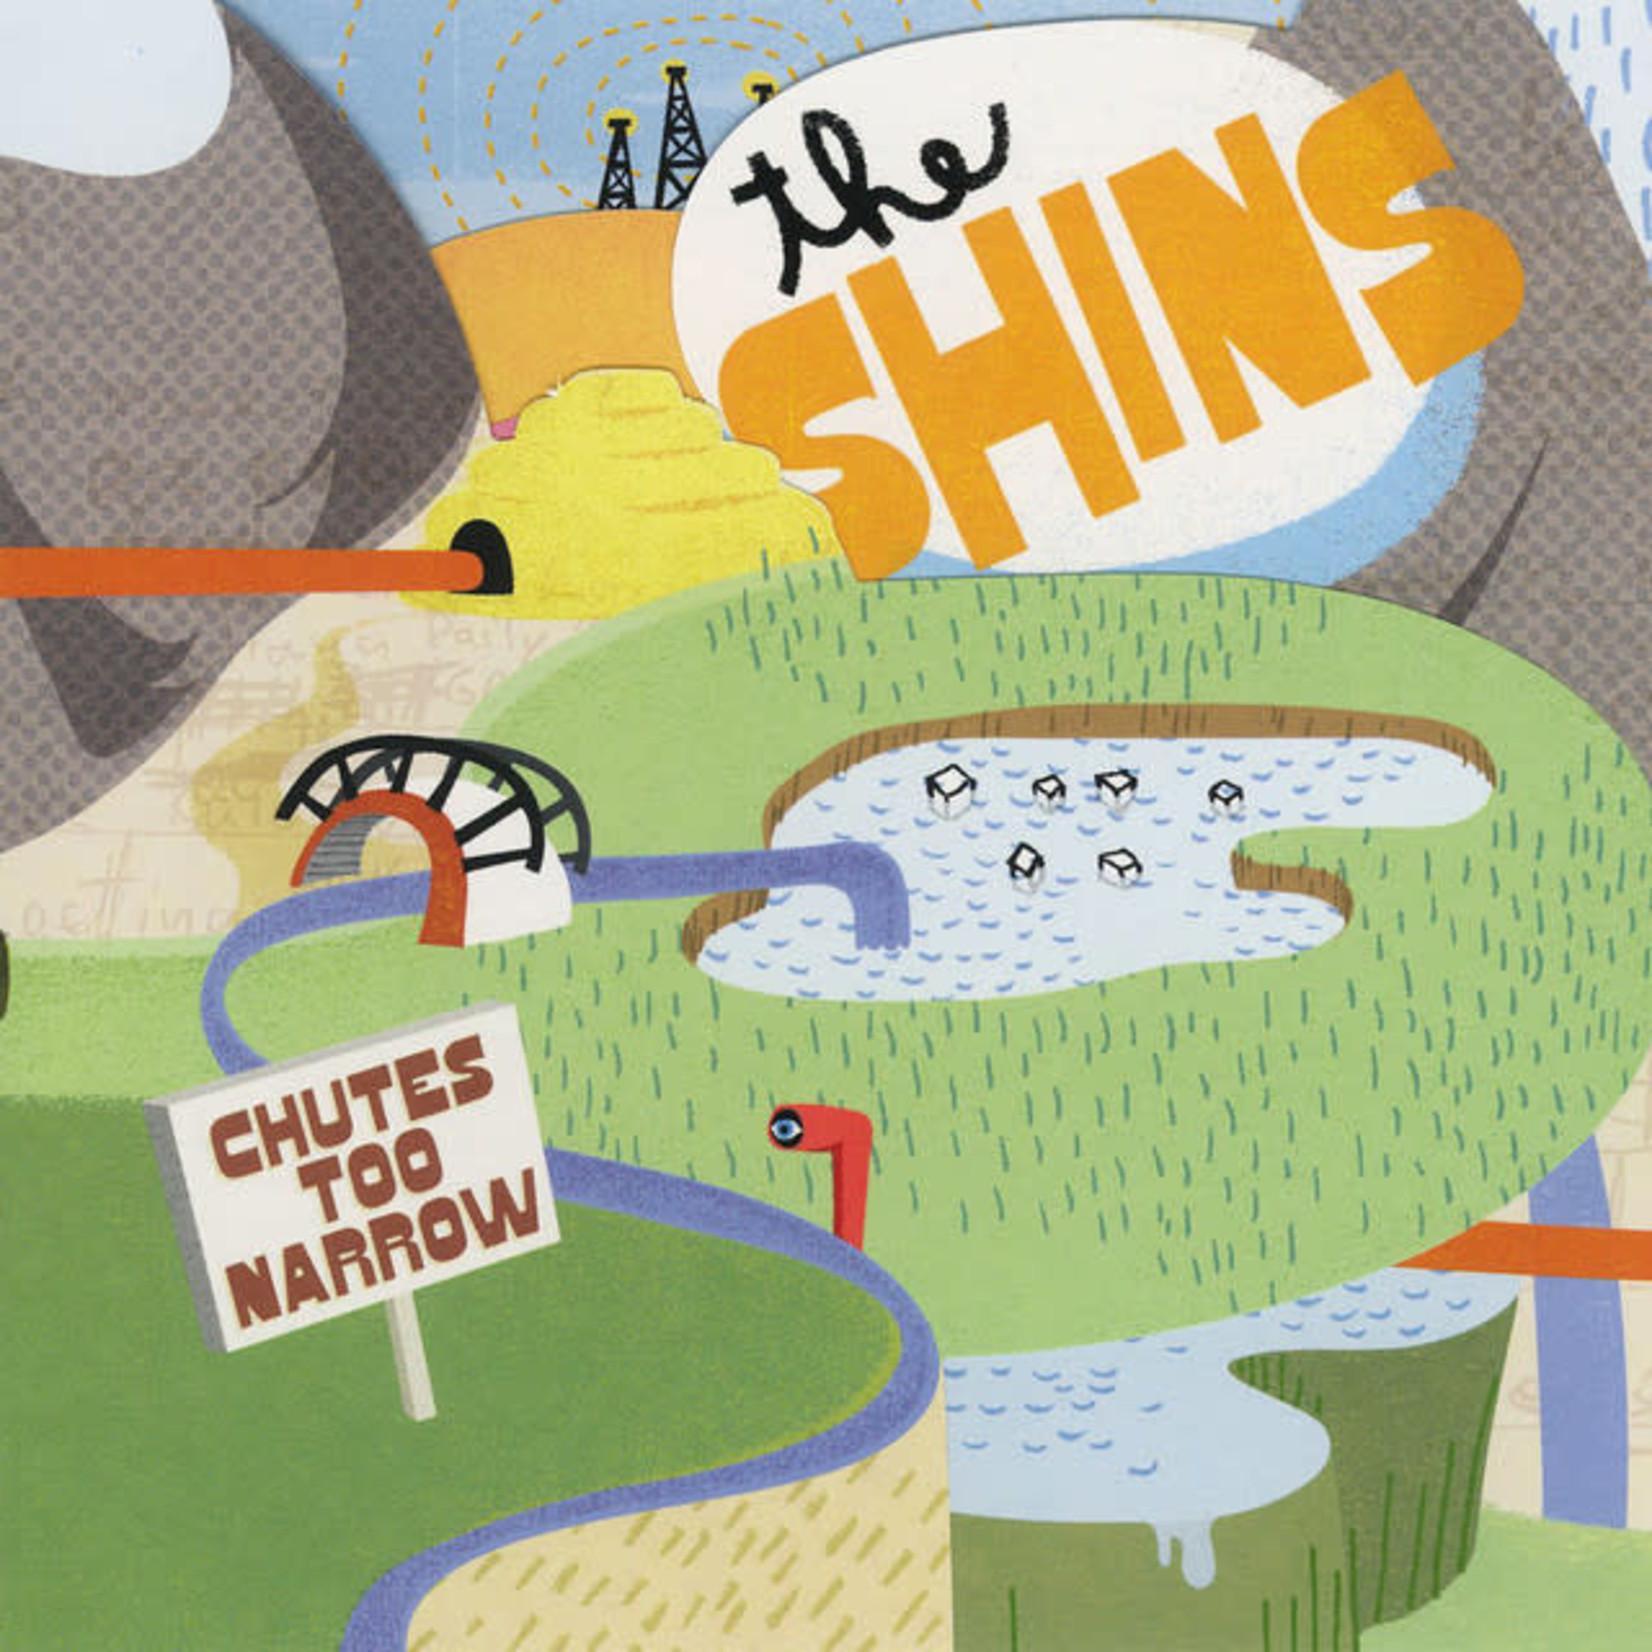 Vinyl The Shins - Chutes Too Narrow